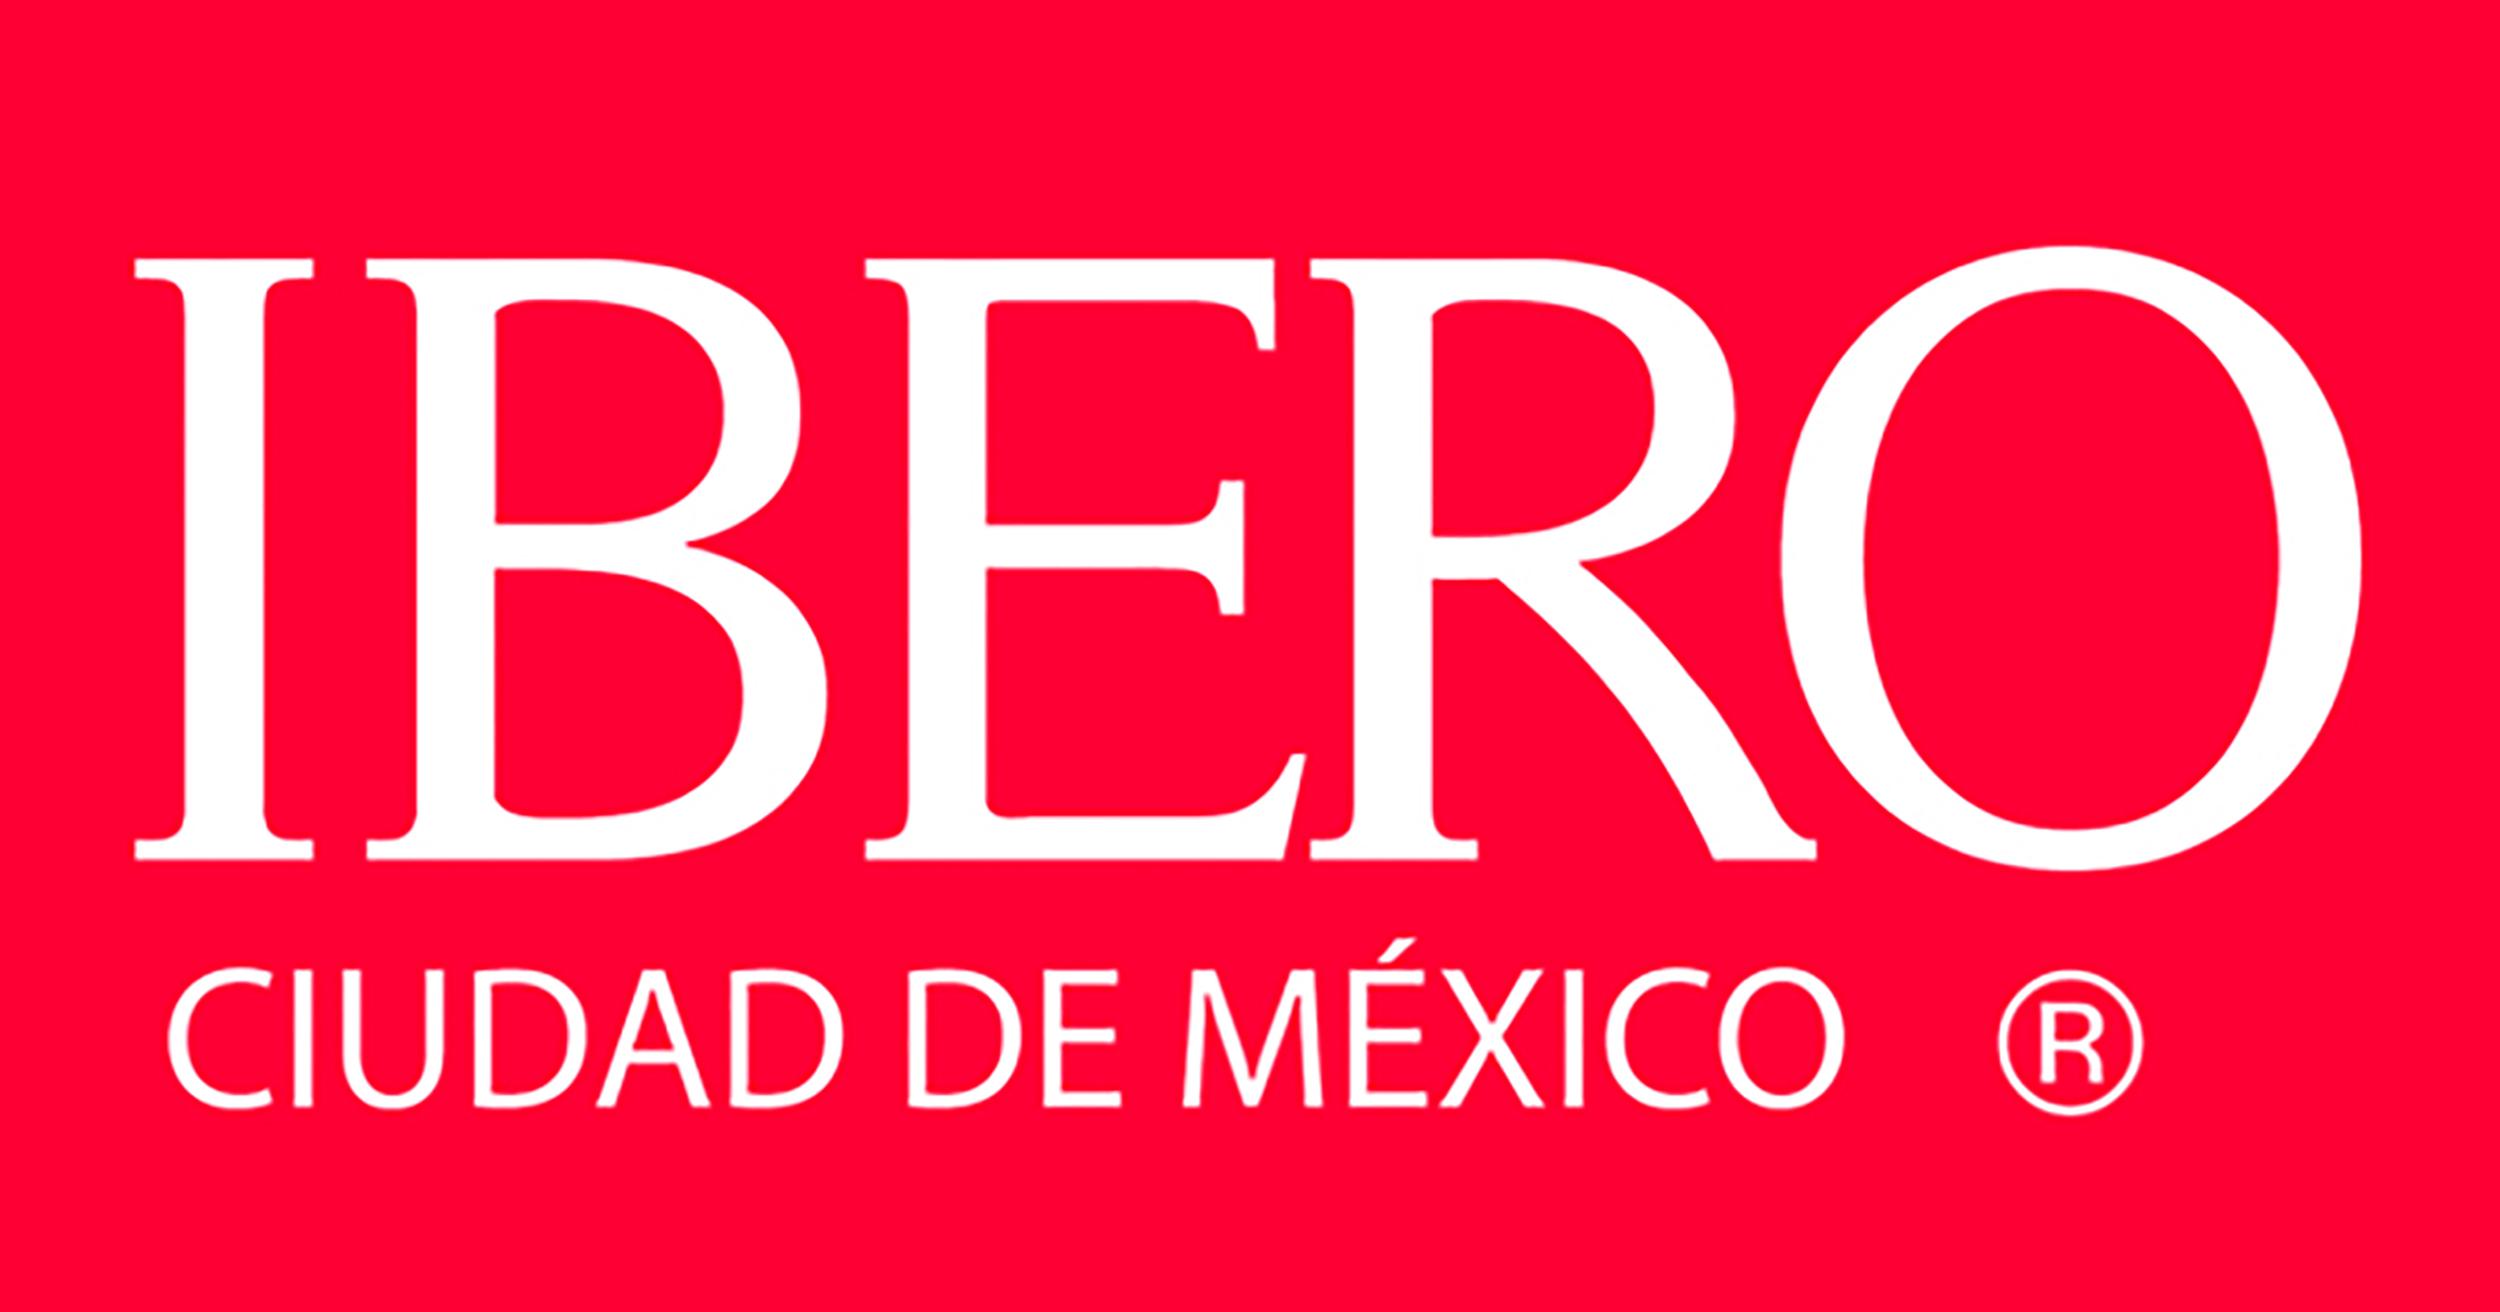 Ibero universidad